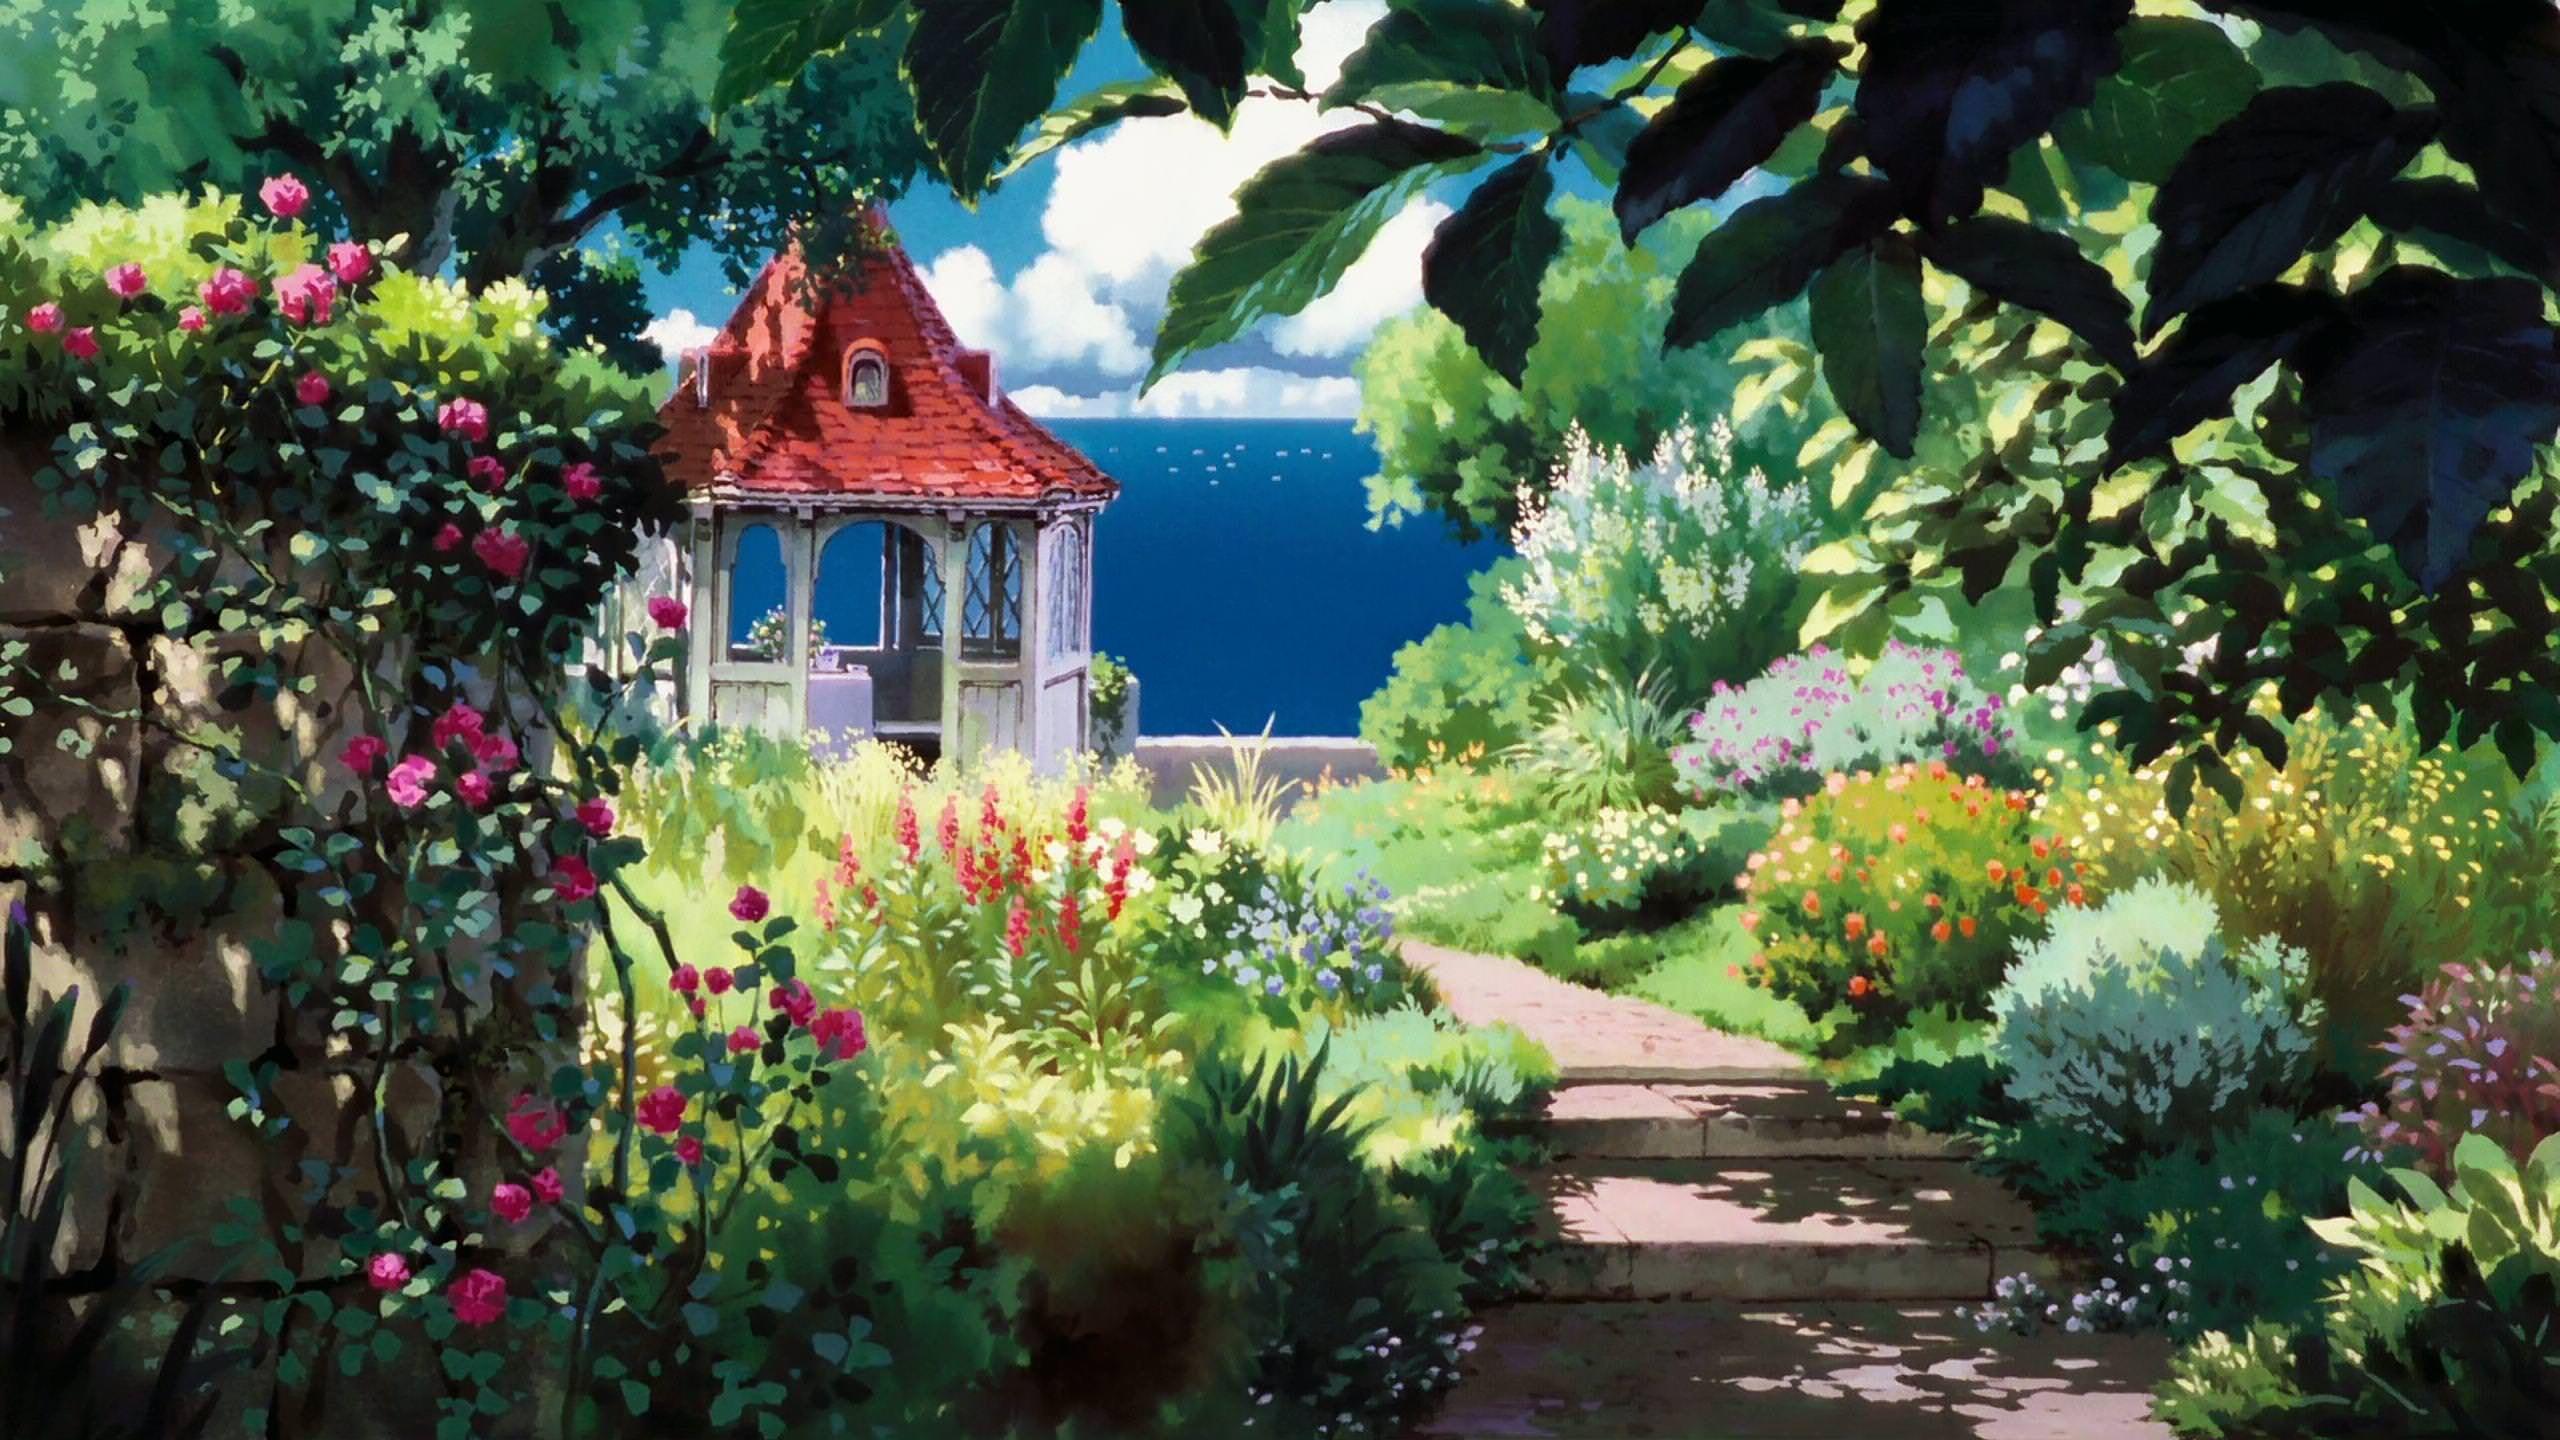 Anime Studio Ghibli Kurenai No Buta 2k Wallpaper Hdwallpaper Desktop In 2020 Studio Ghibli Background Studio Ghibli Ghibli